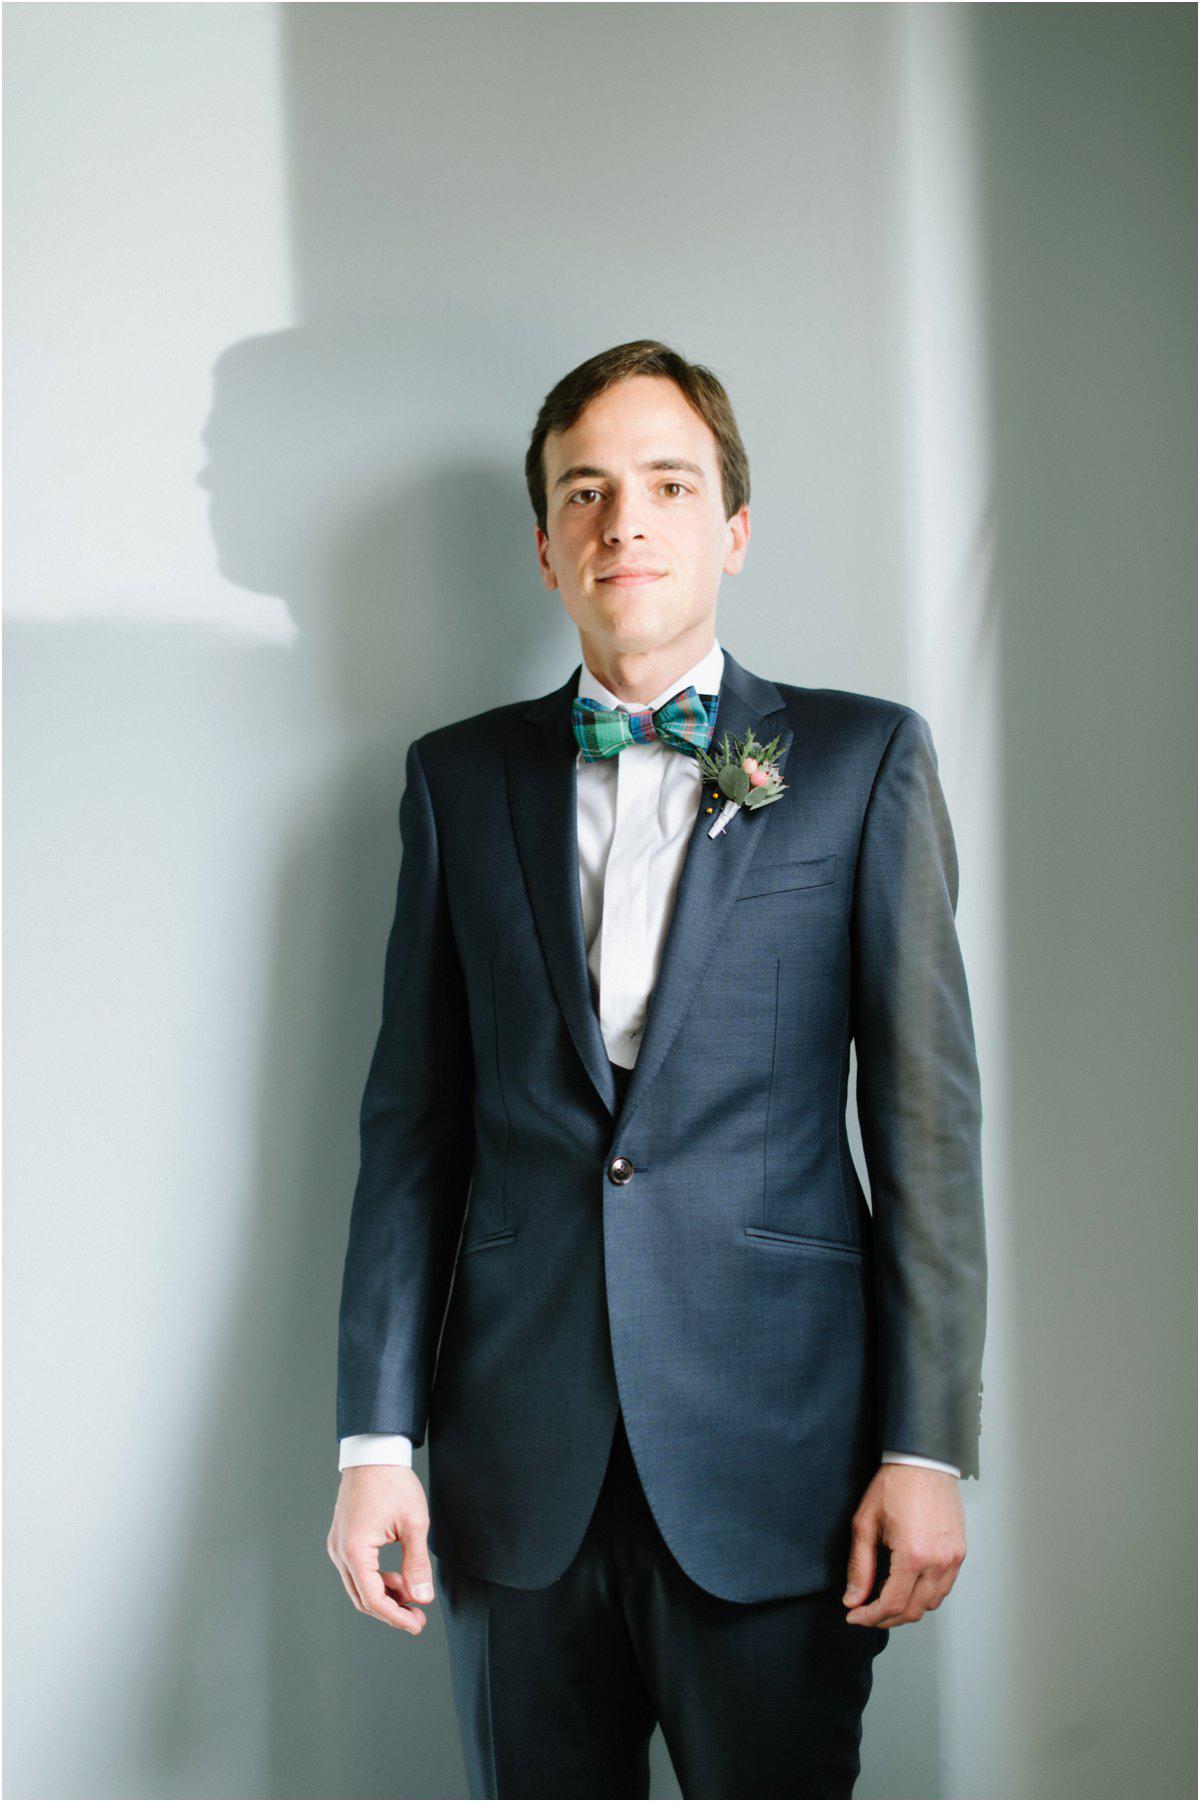 Crofts & Kowalczyk Best Wedding Photography Scotland Blogpost-64.jpg